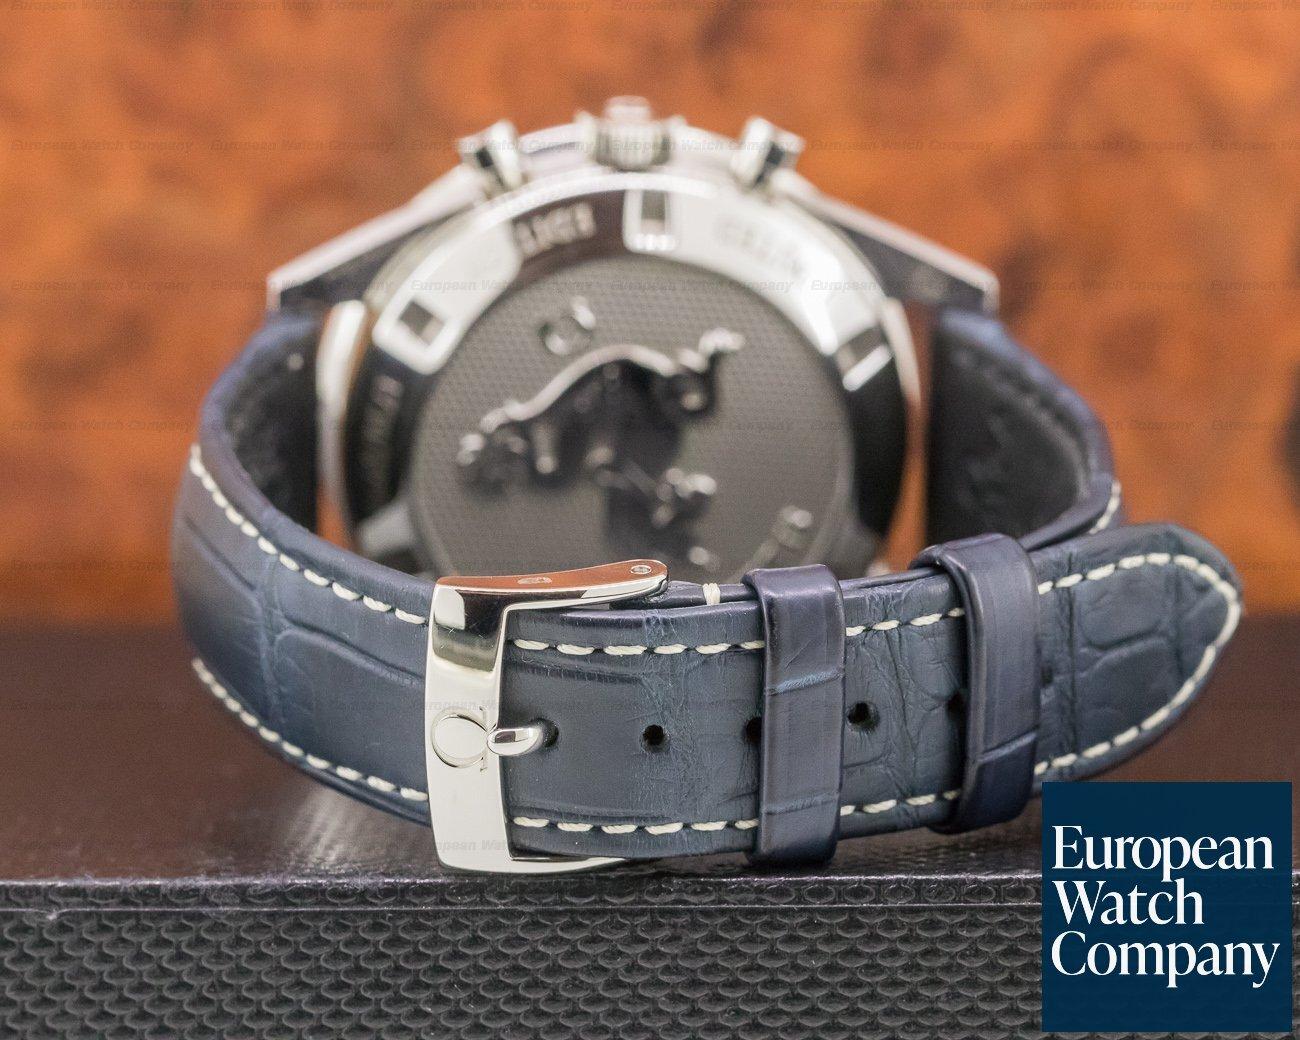 Omega 311.33.40.30.02.001 Speedmaster CK 2998 Silver / Blue Dial LIMITED